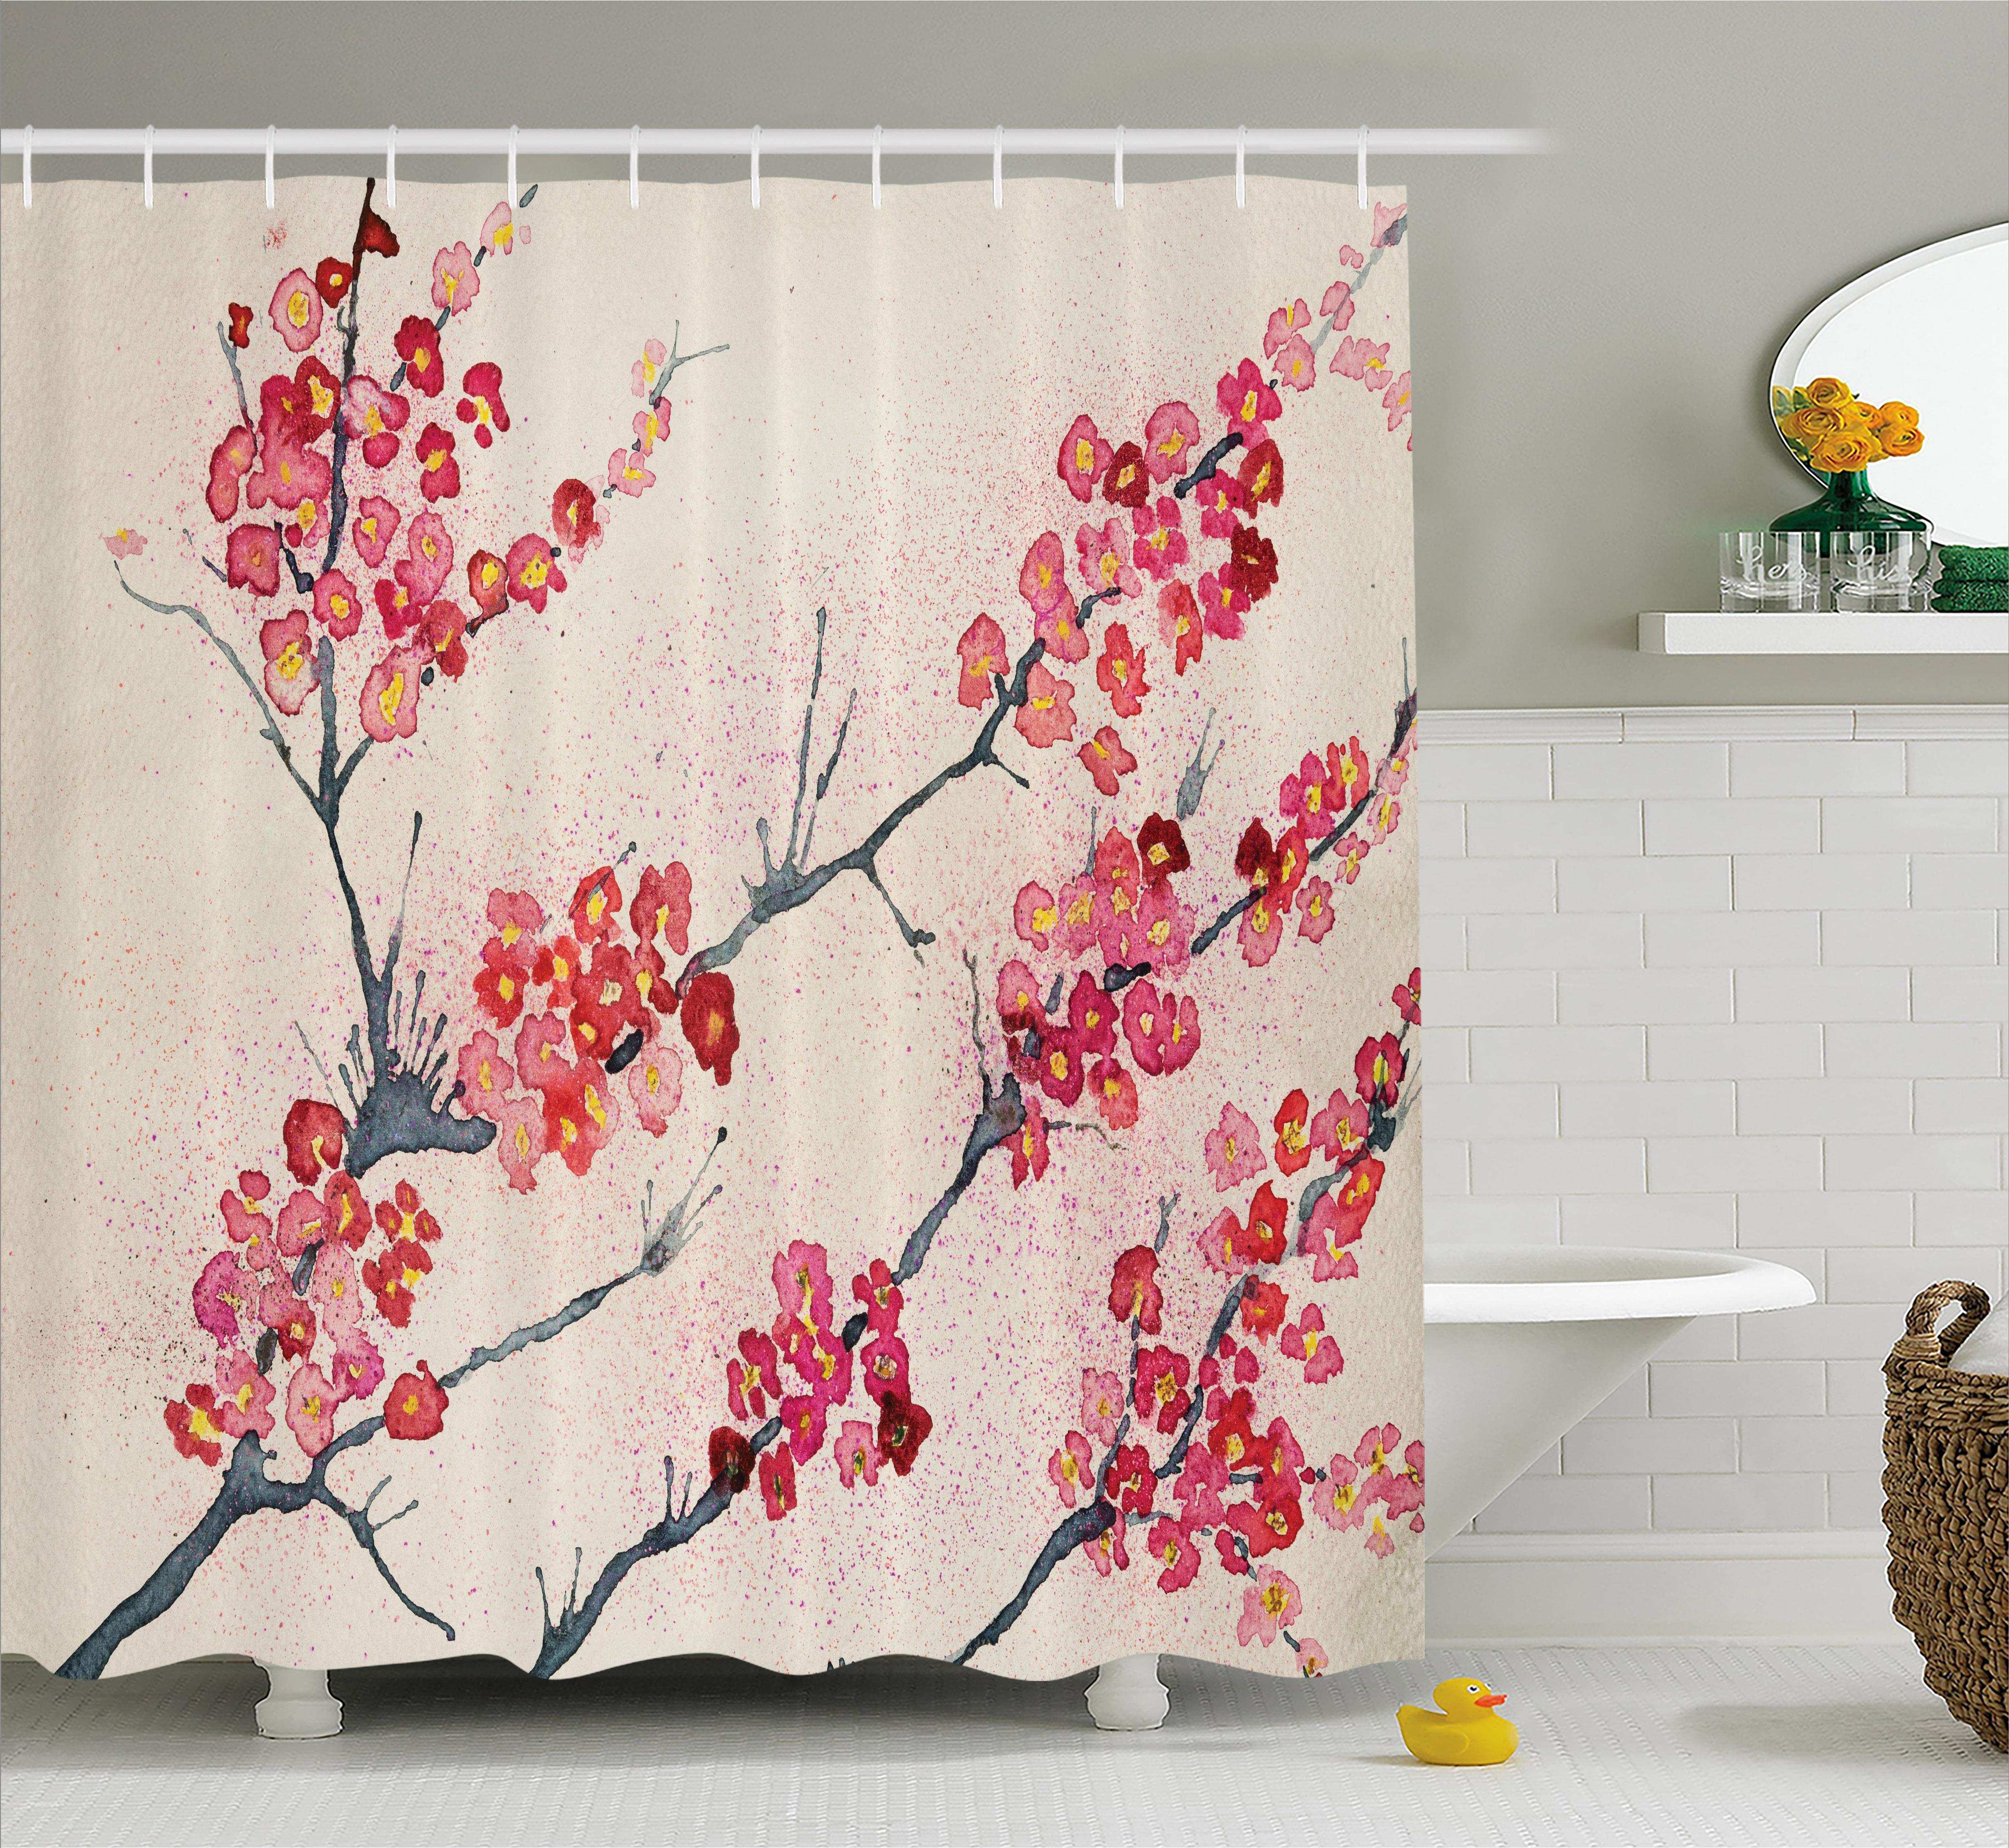 Cherry blossom bathroom